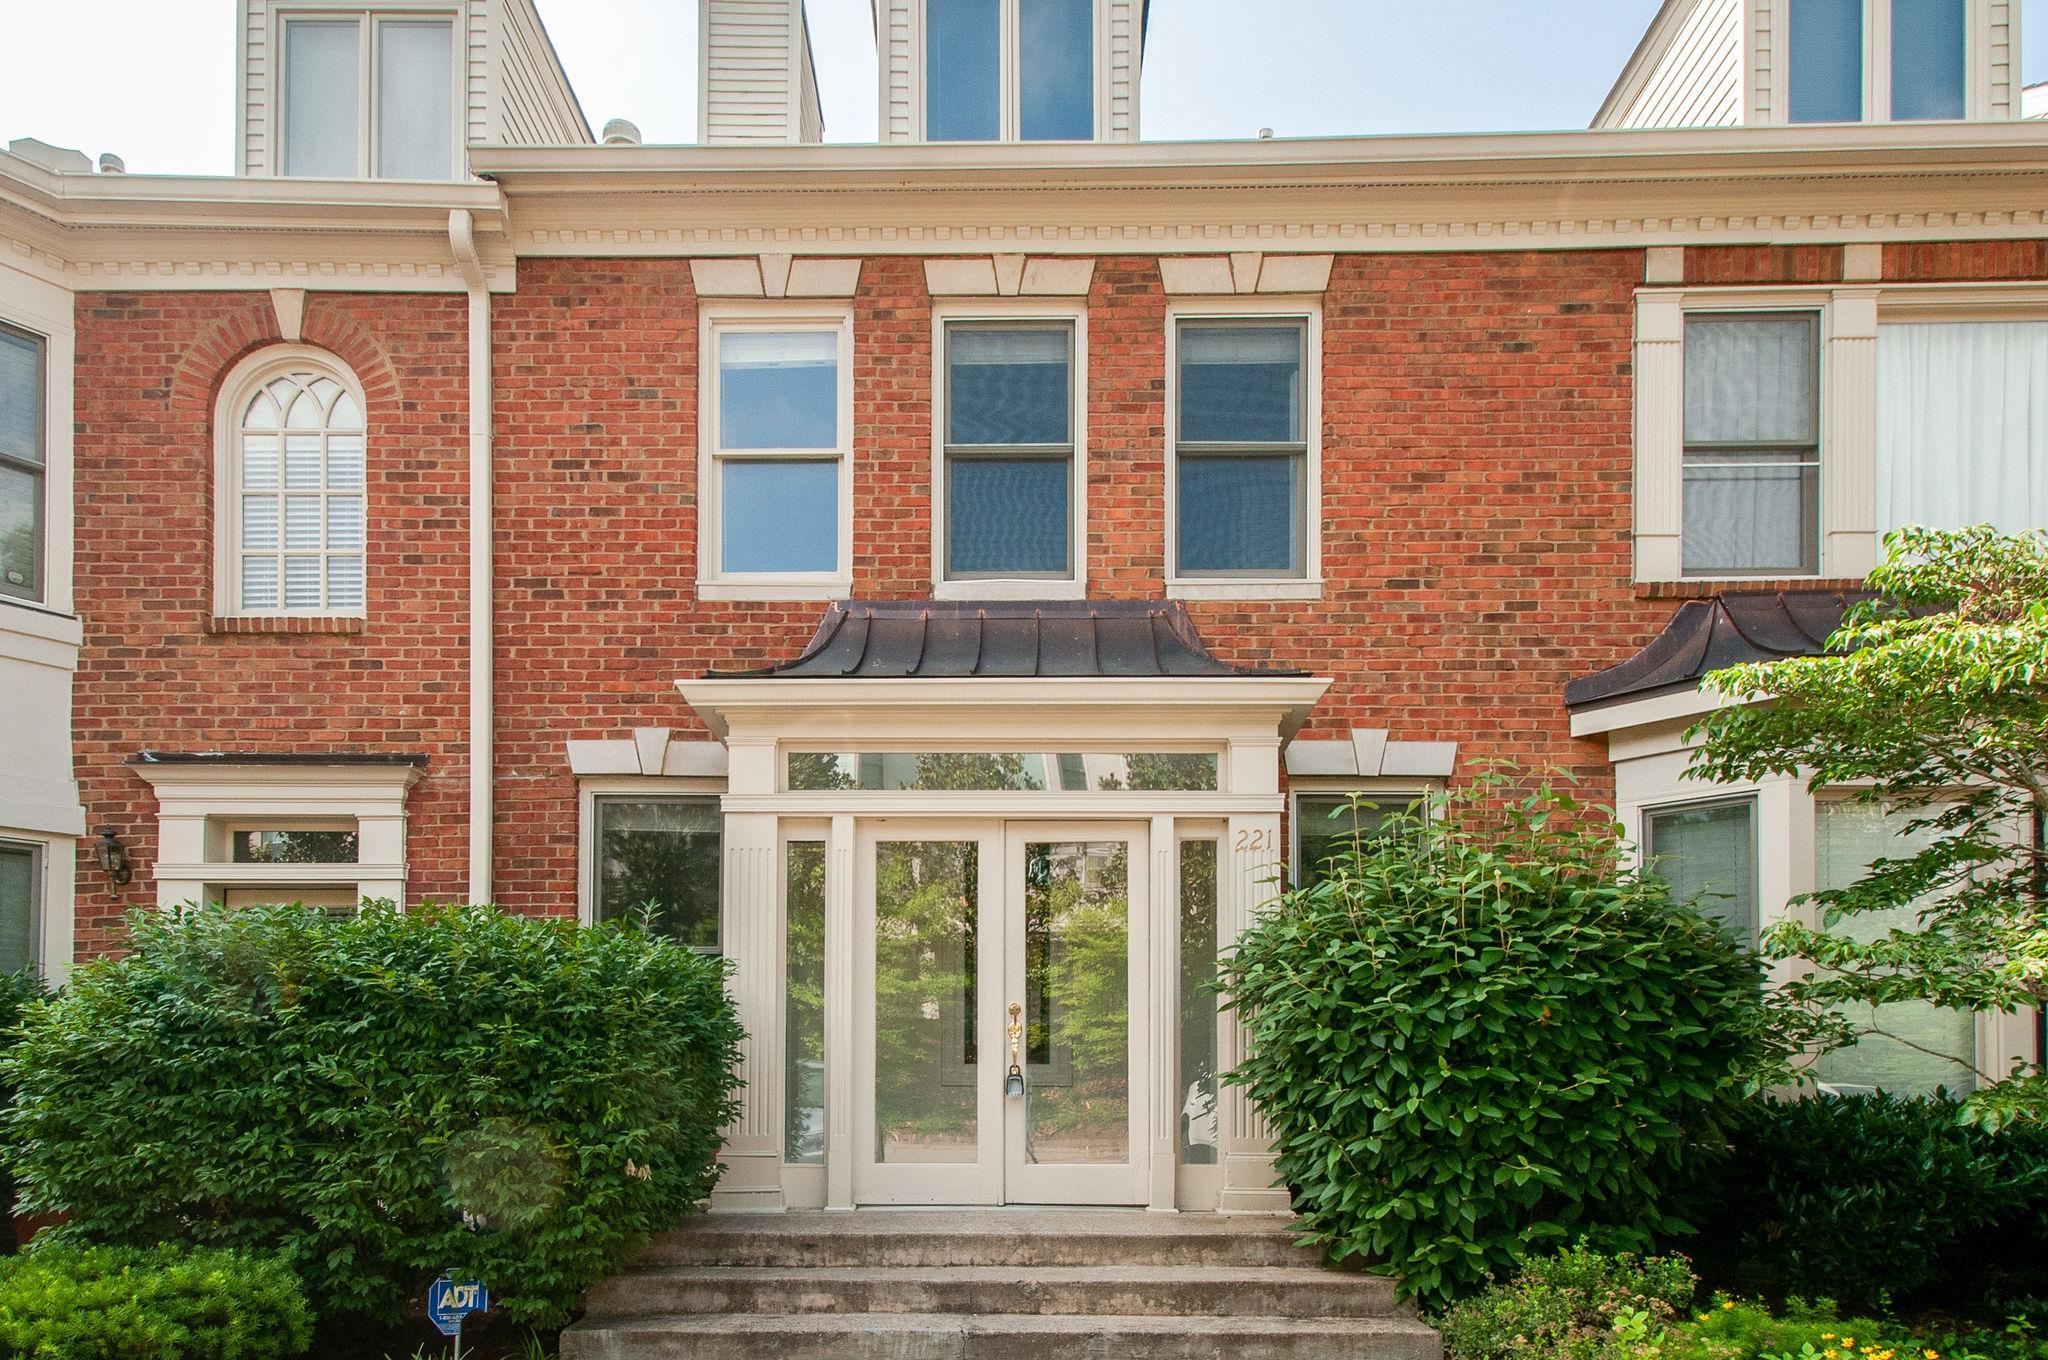 221 Cheswick Ct, Nashville, TN 37215 - Nashville, TN real estate listing